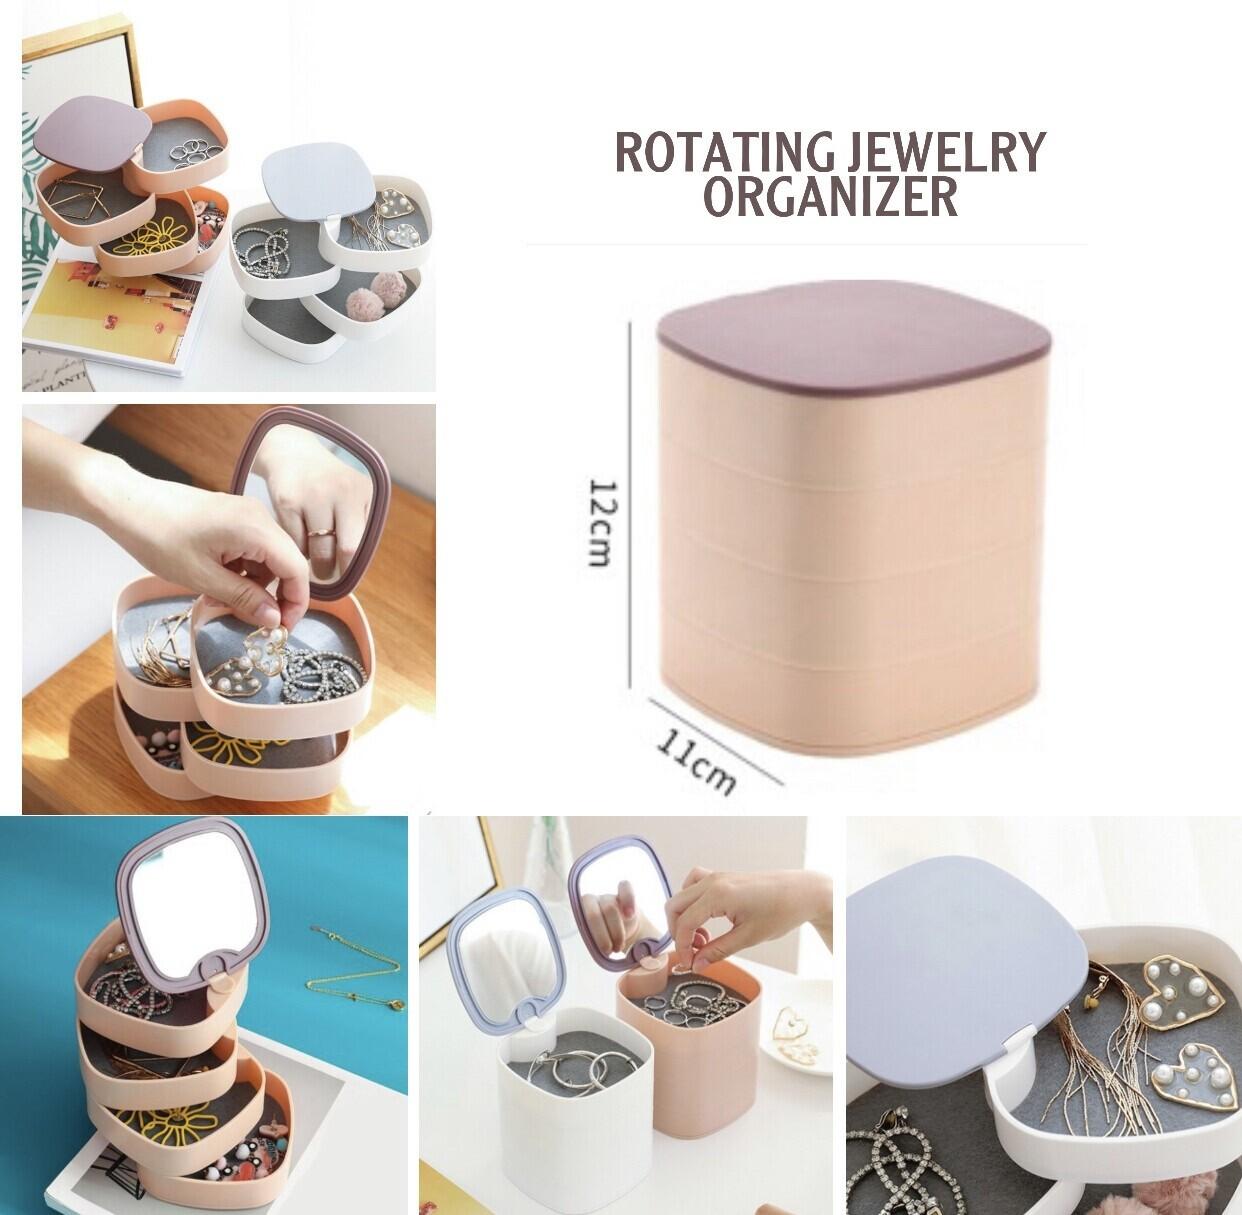 Rotating Jewelry Organizer